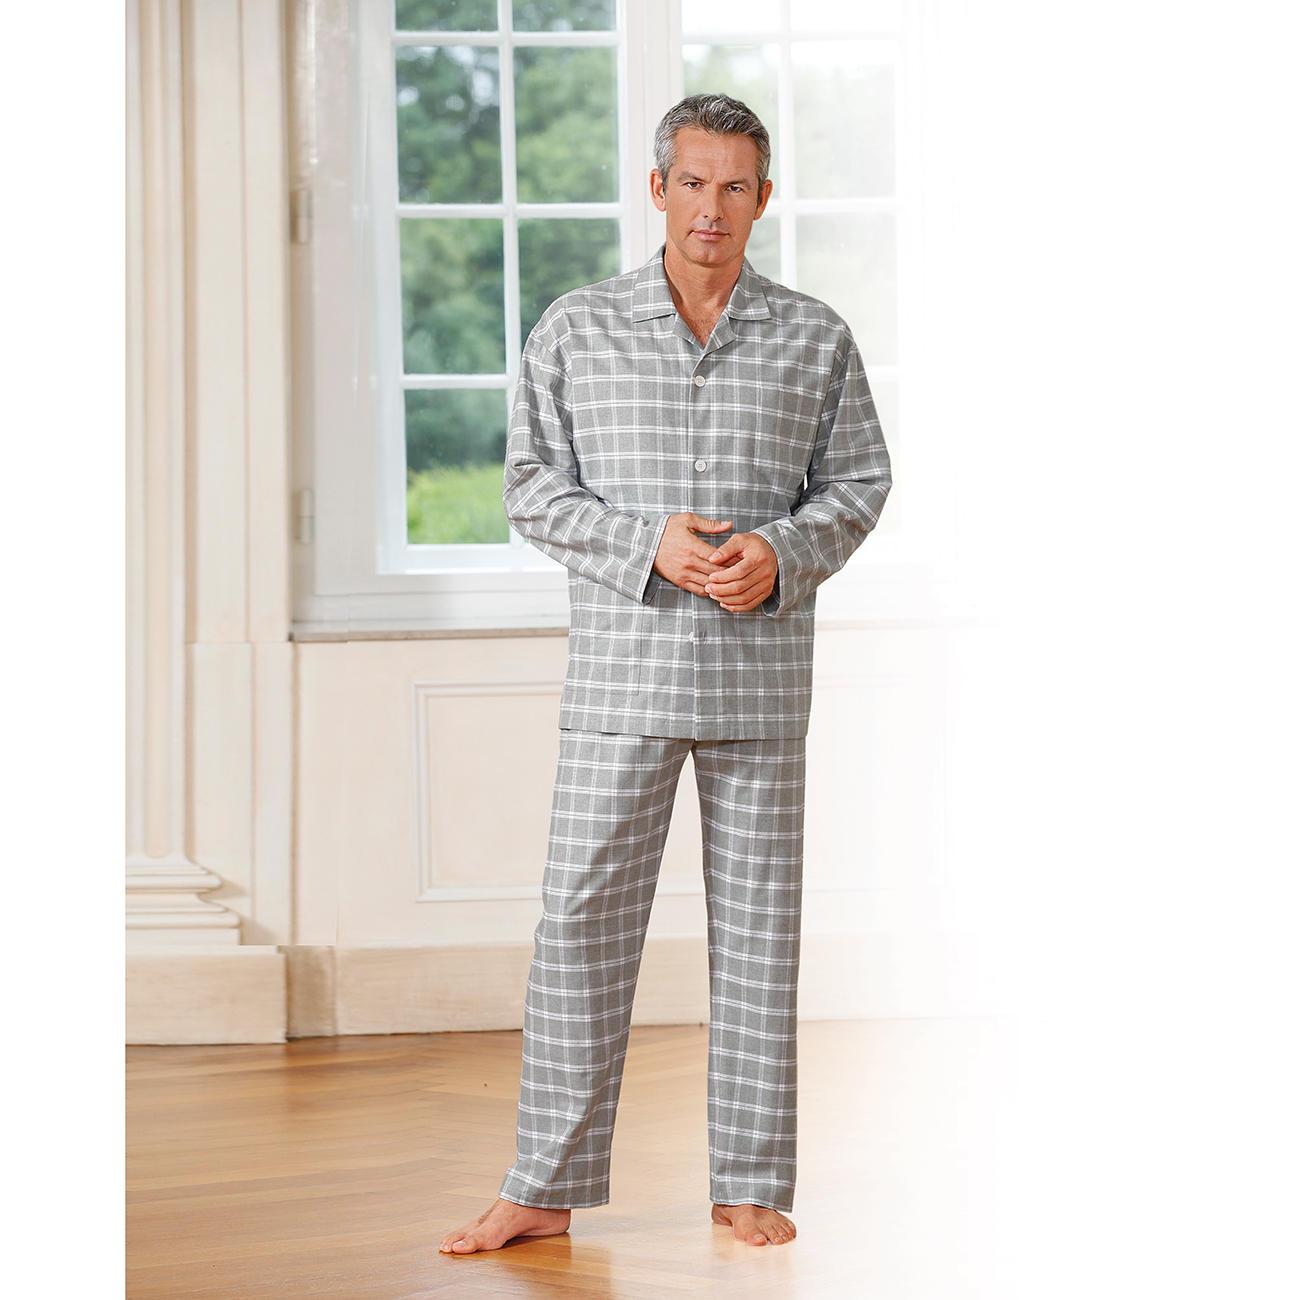 novila flanell pyjama 3 jahre garantie pro idee. Black Bedroom Furniture Sets. Home Design Ideas